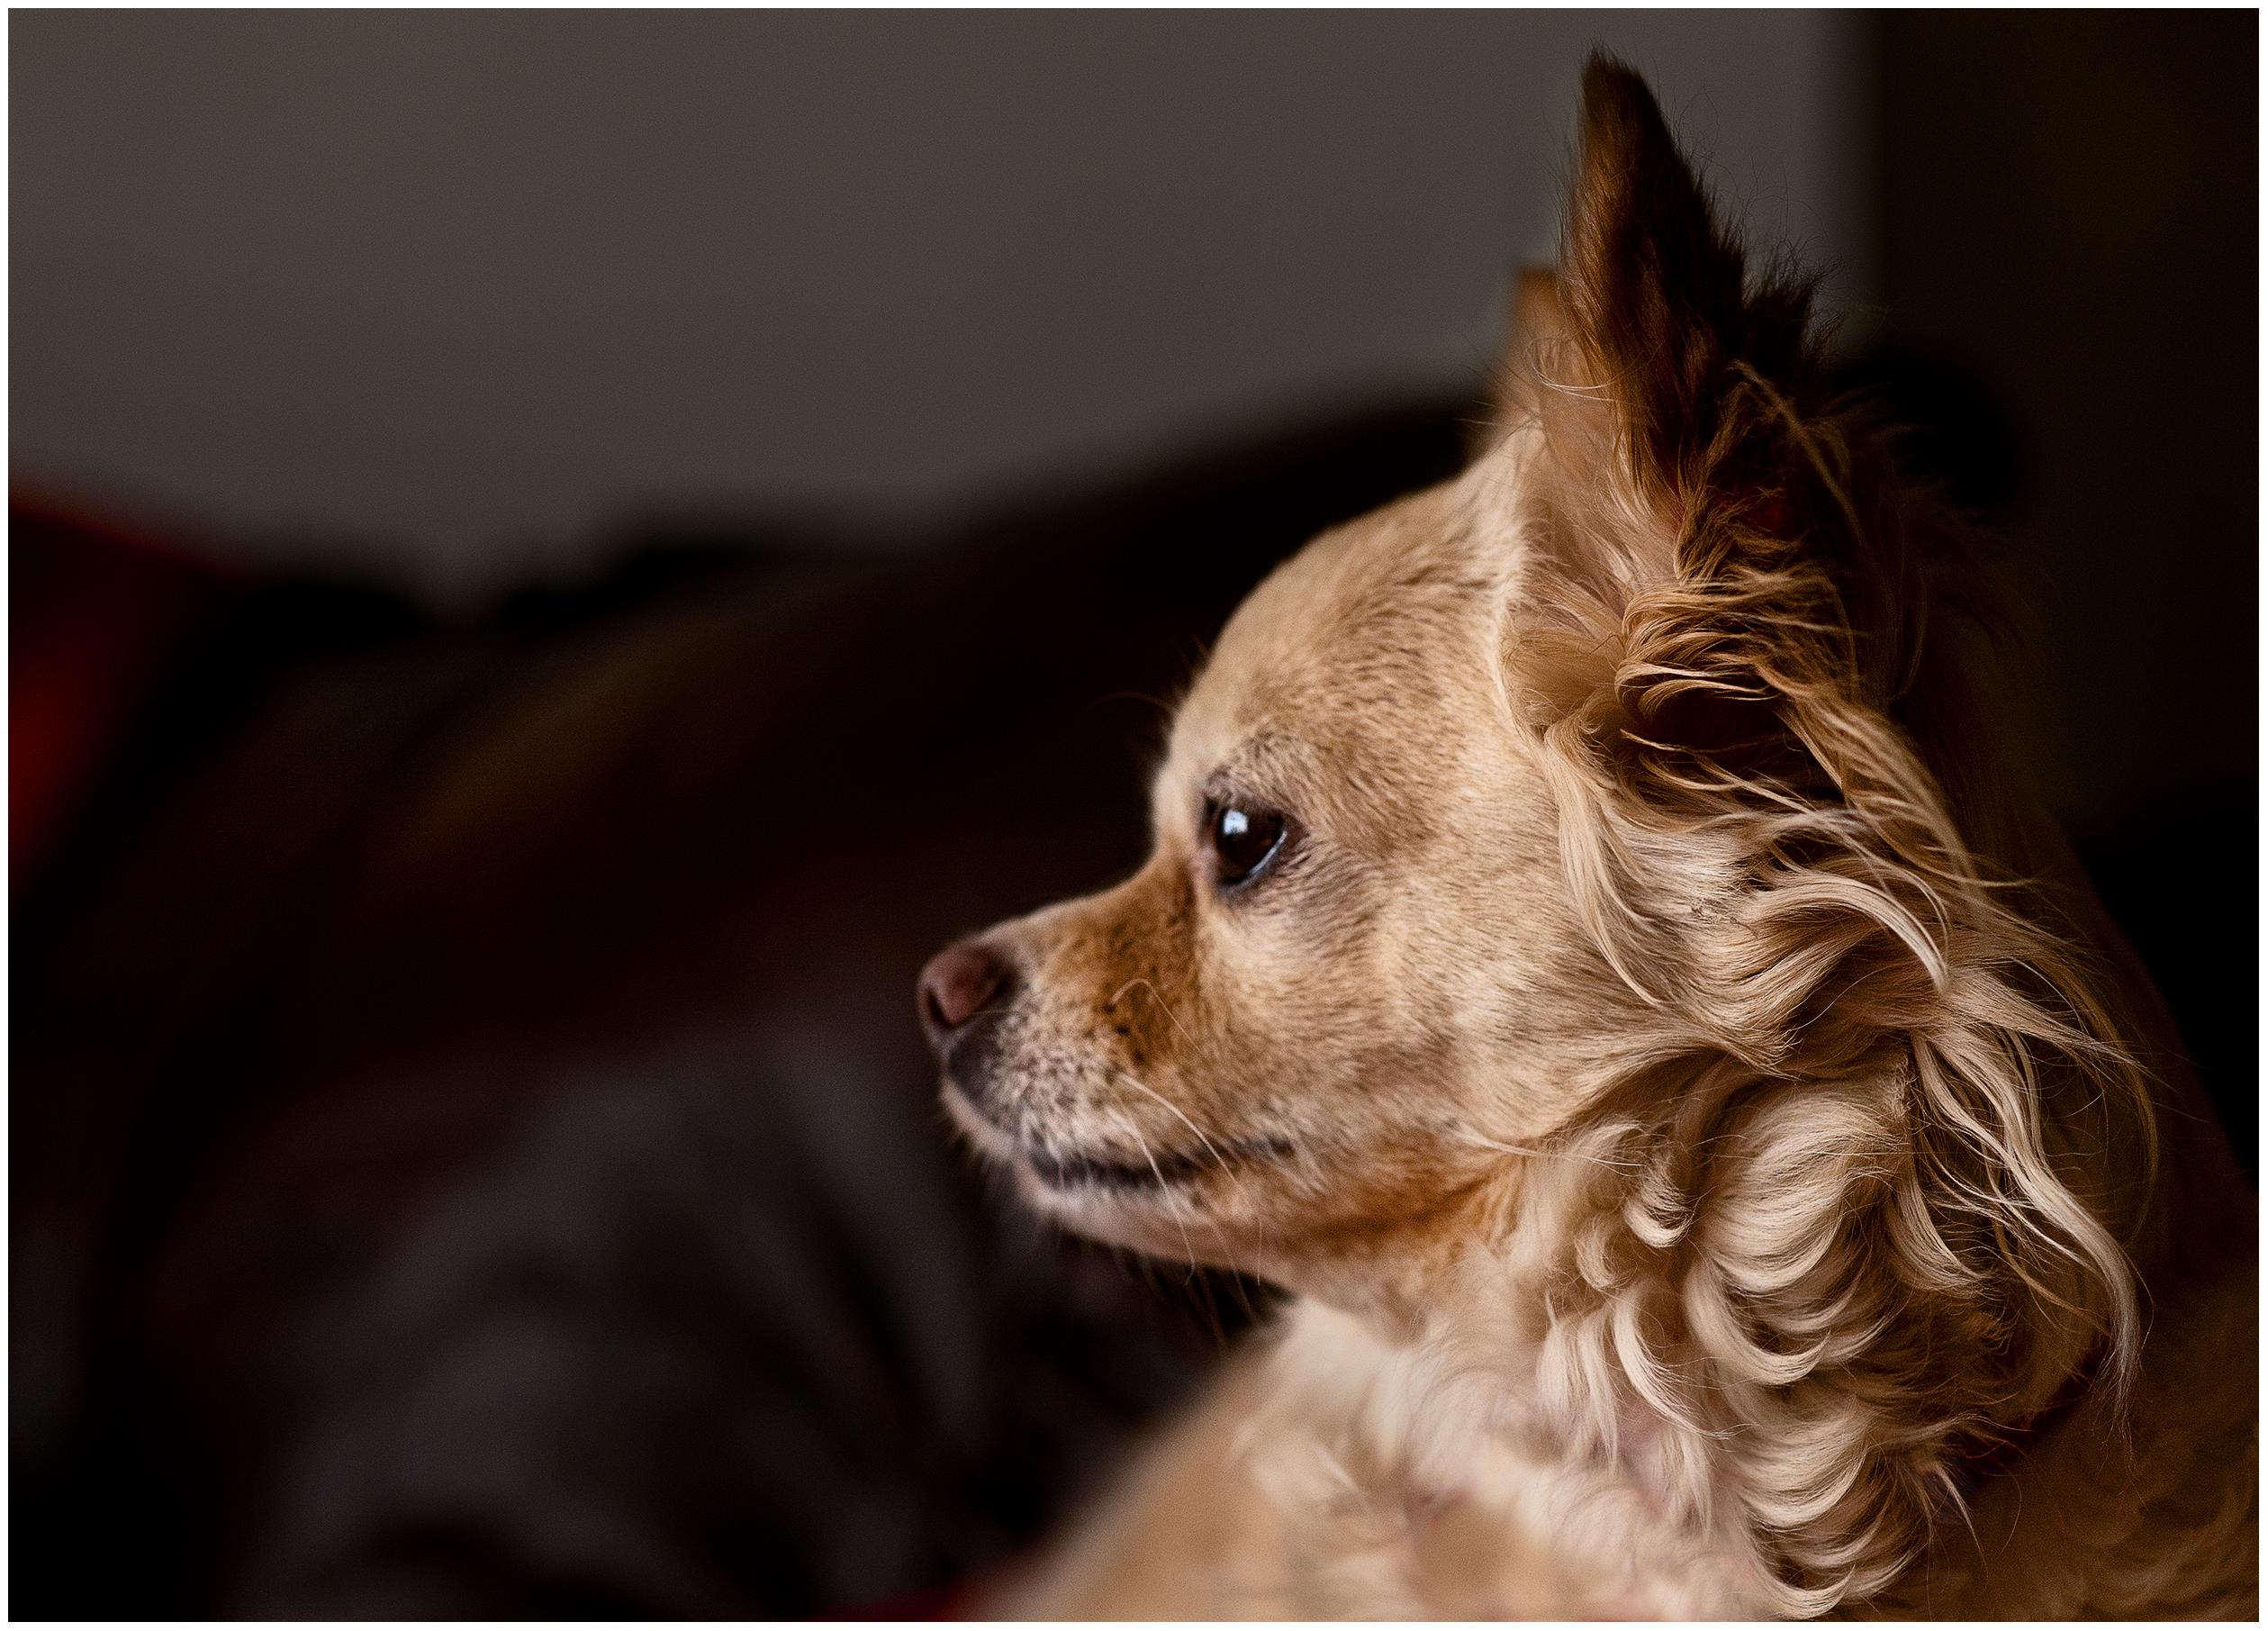 O Dog Hairstyle: Flickr - Photo Sharing